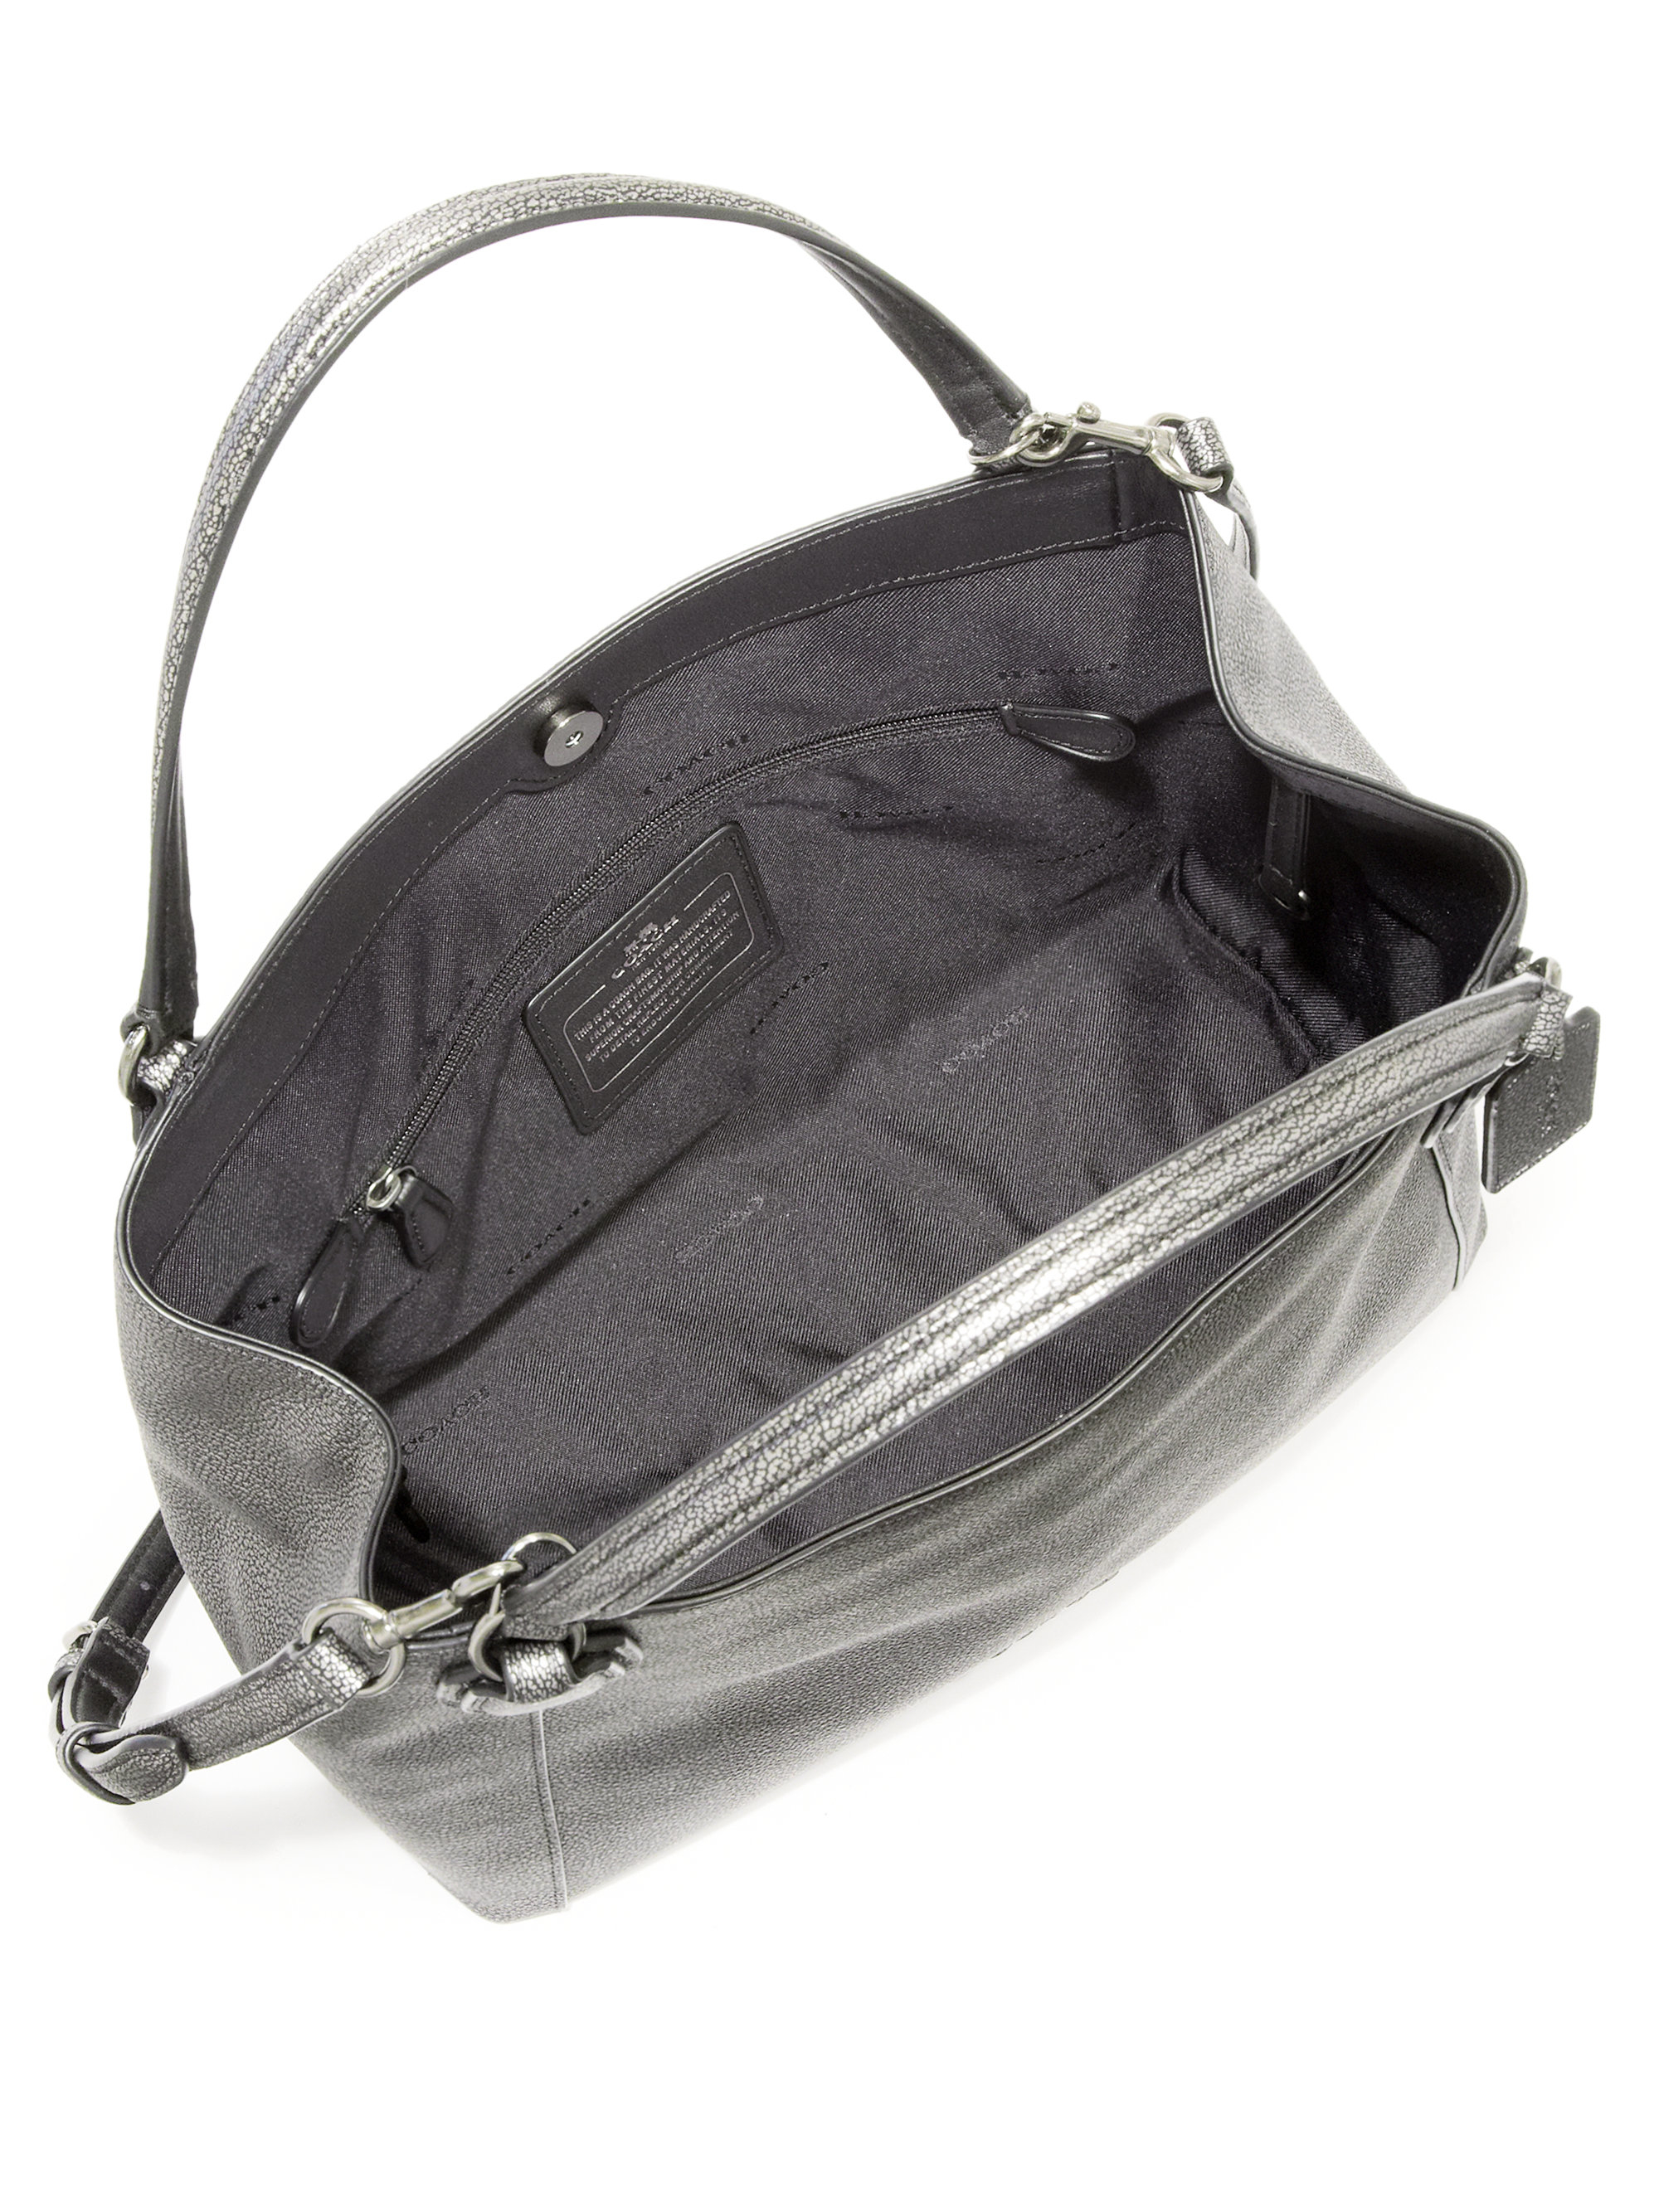 94ea98874b ... coupon code for lyst coach edie metallic pebbled leather shoulder bag  in metallic 707df 8afbd